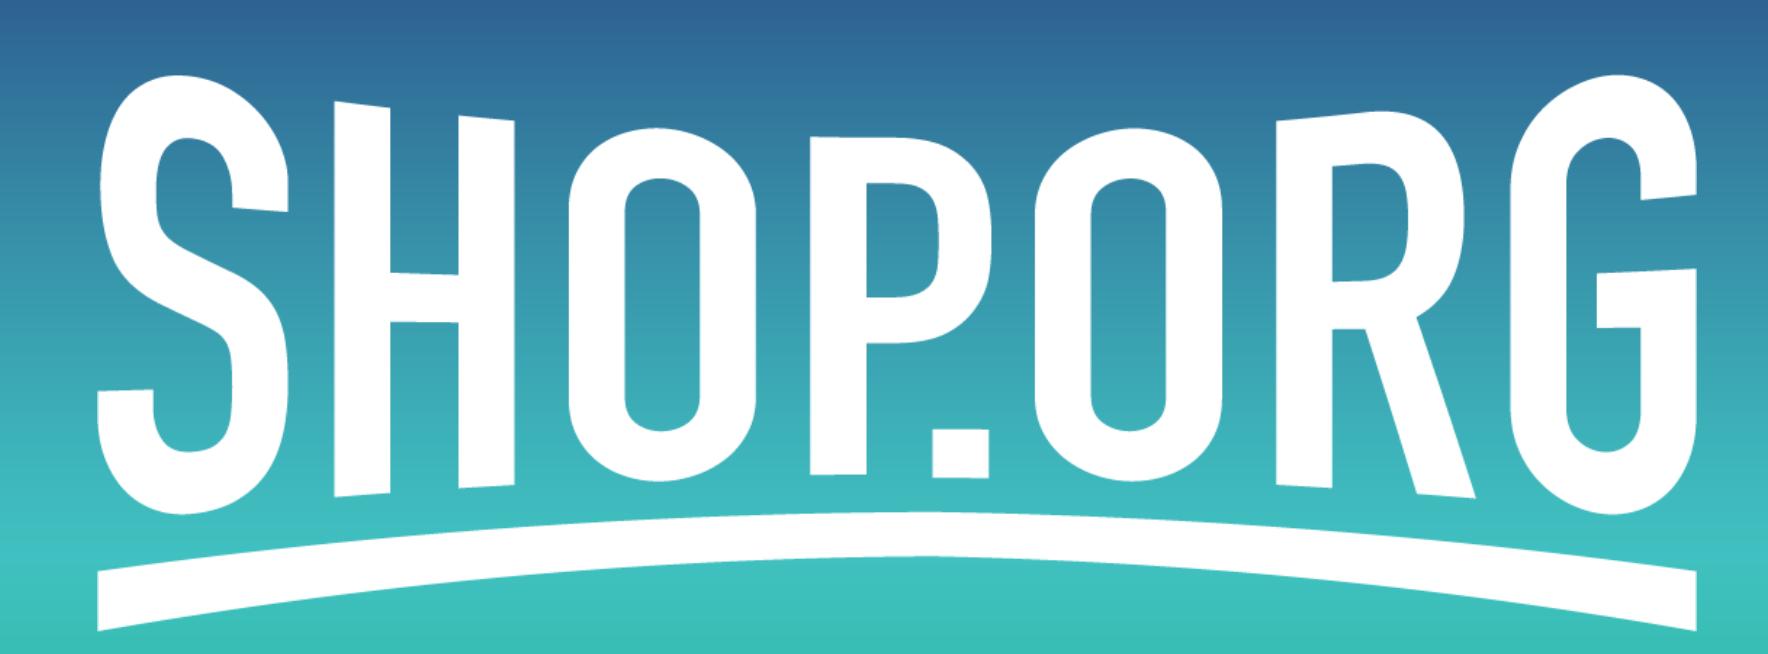 shop.org summit